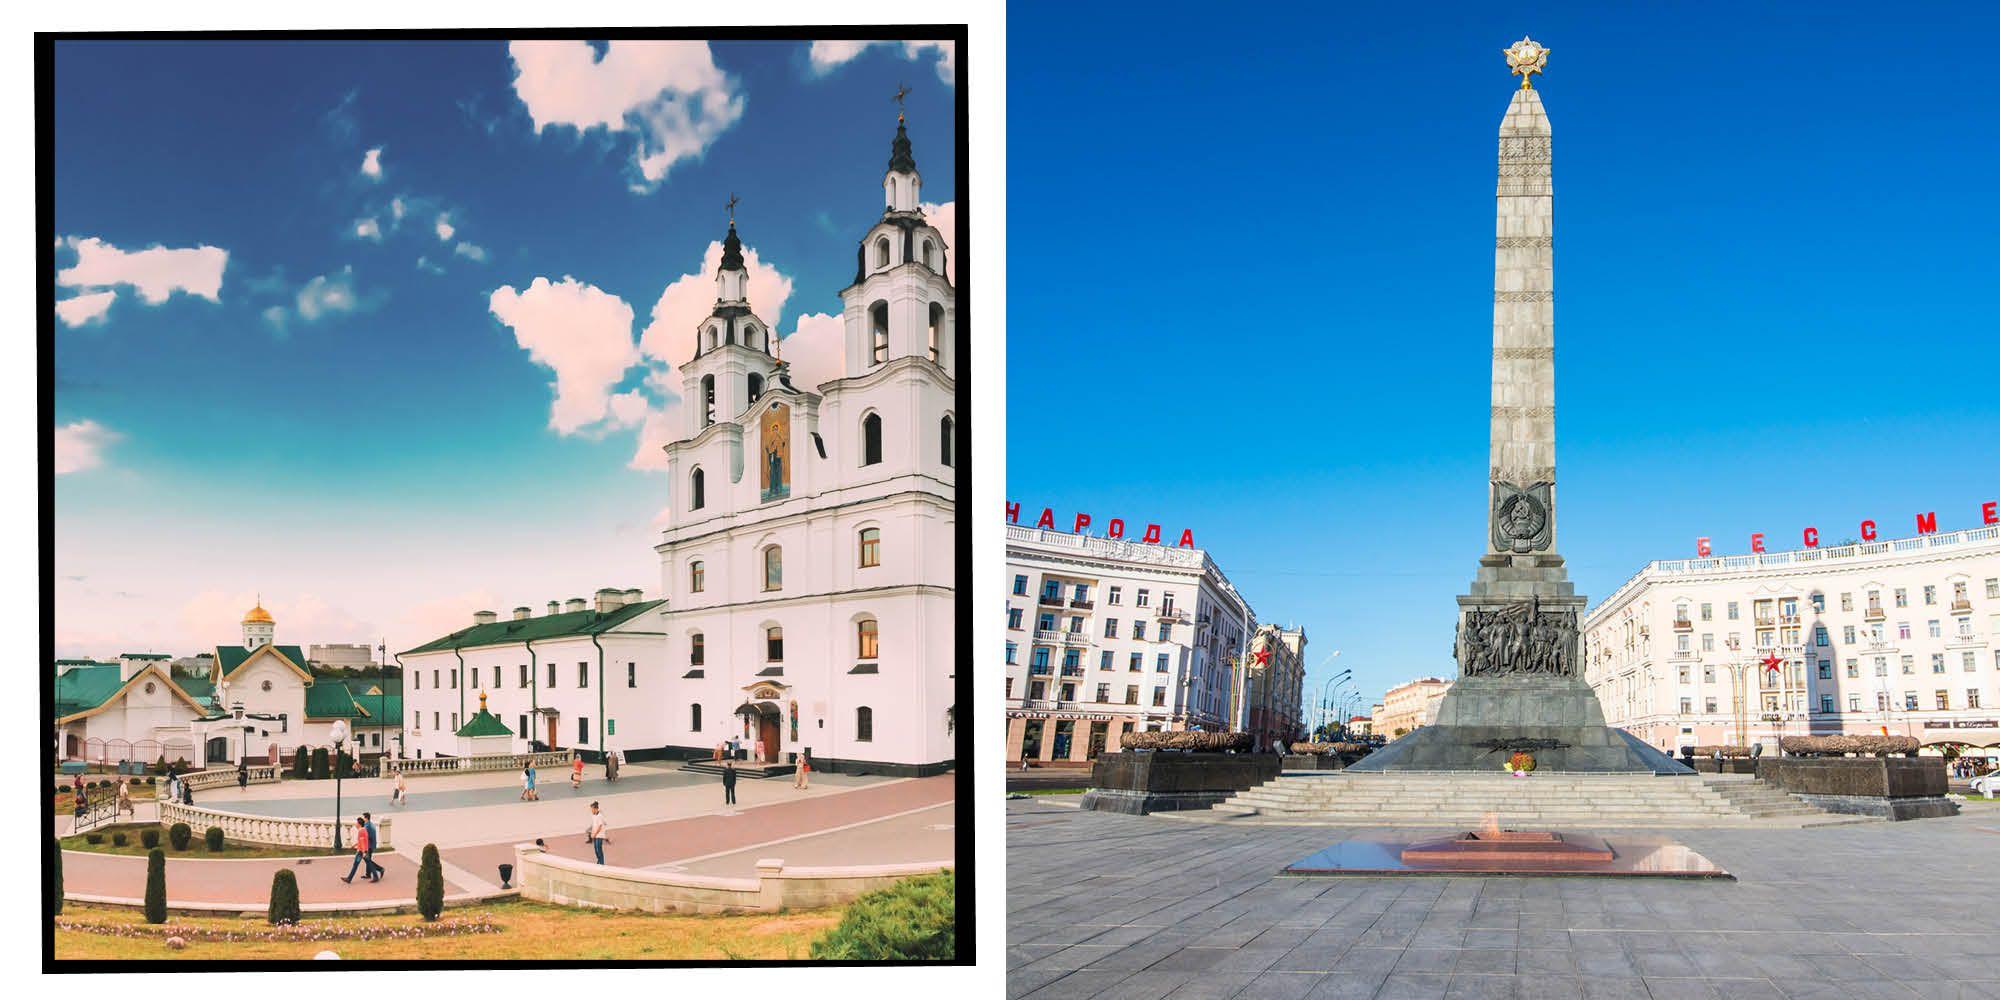 [Image: belarus-panama2-1540304541.jpg?crop=1xw:...size=480:*]